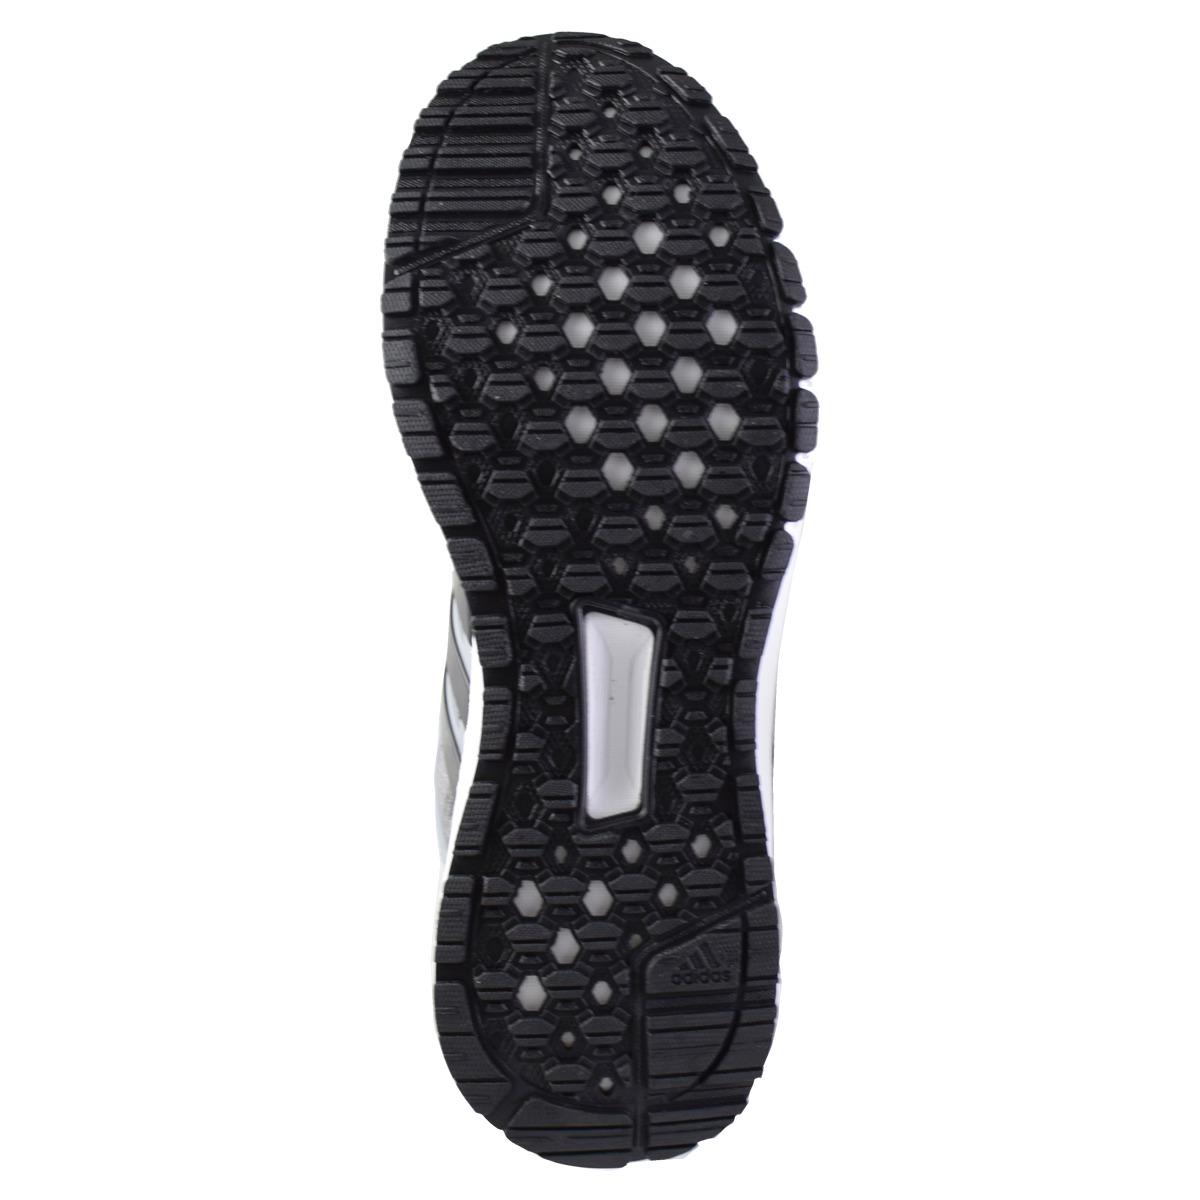 finest selection 96b19 33290 zapatillas adidas energy cloud wtc hombre grisnegro. Cargando zoom... zapatillas  adidas hombre. Cargando zoom.